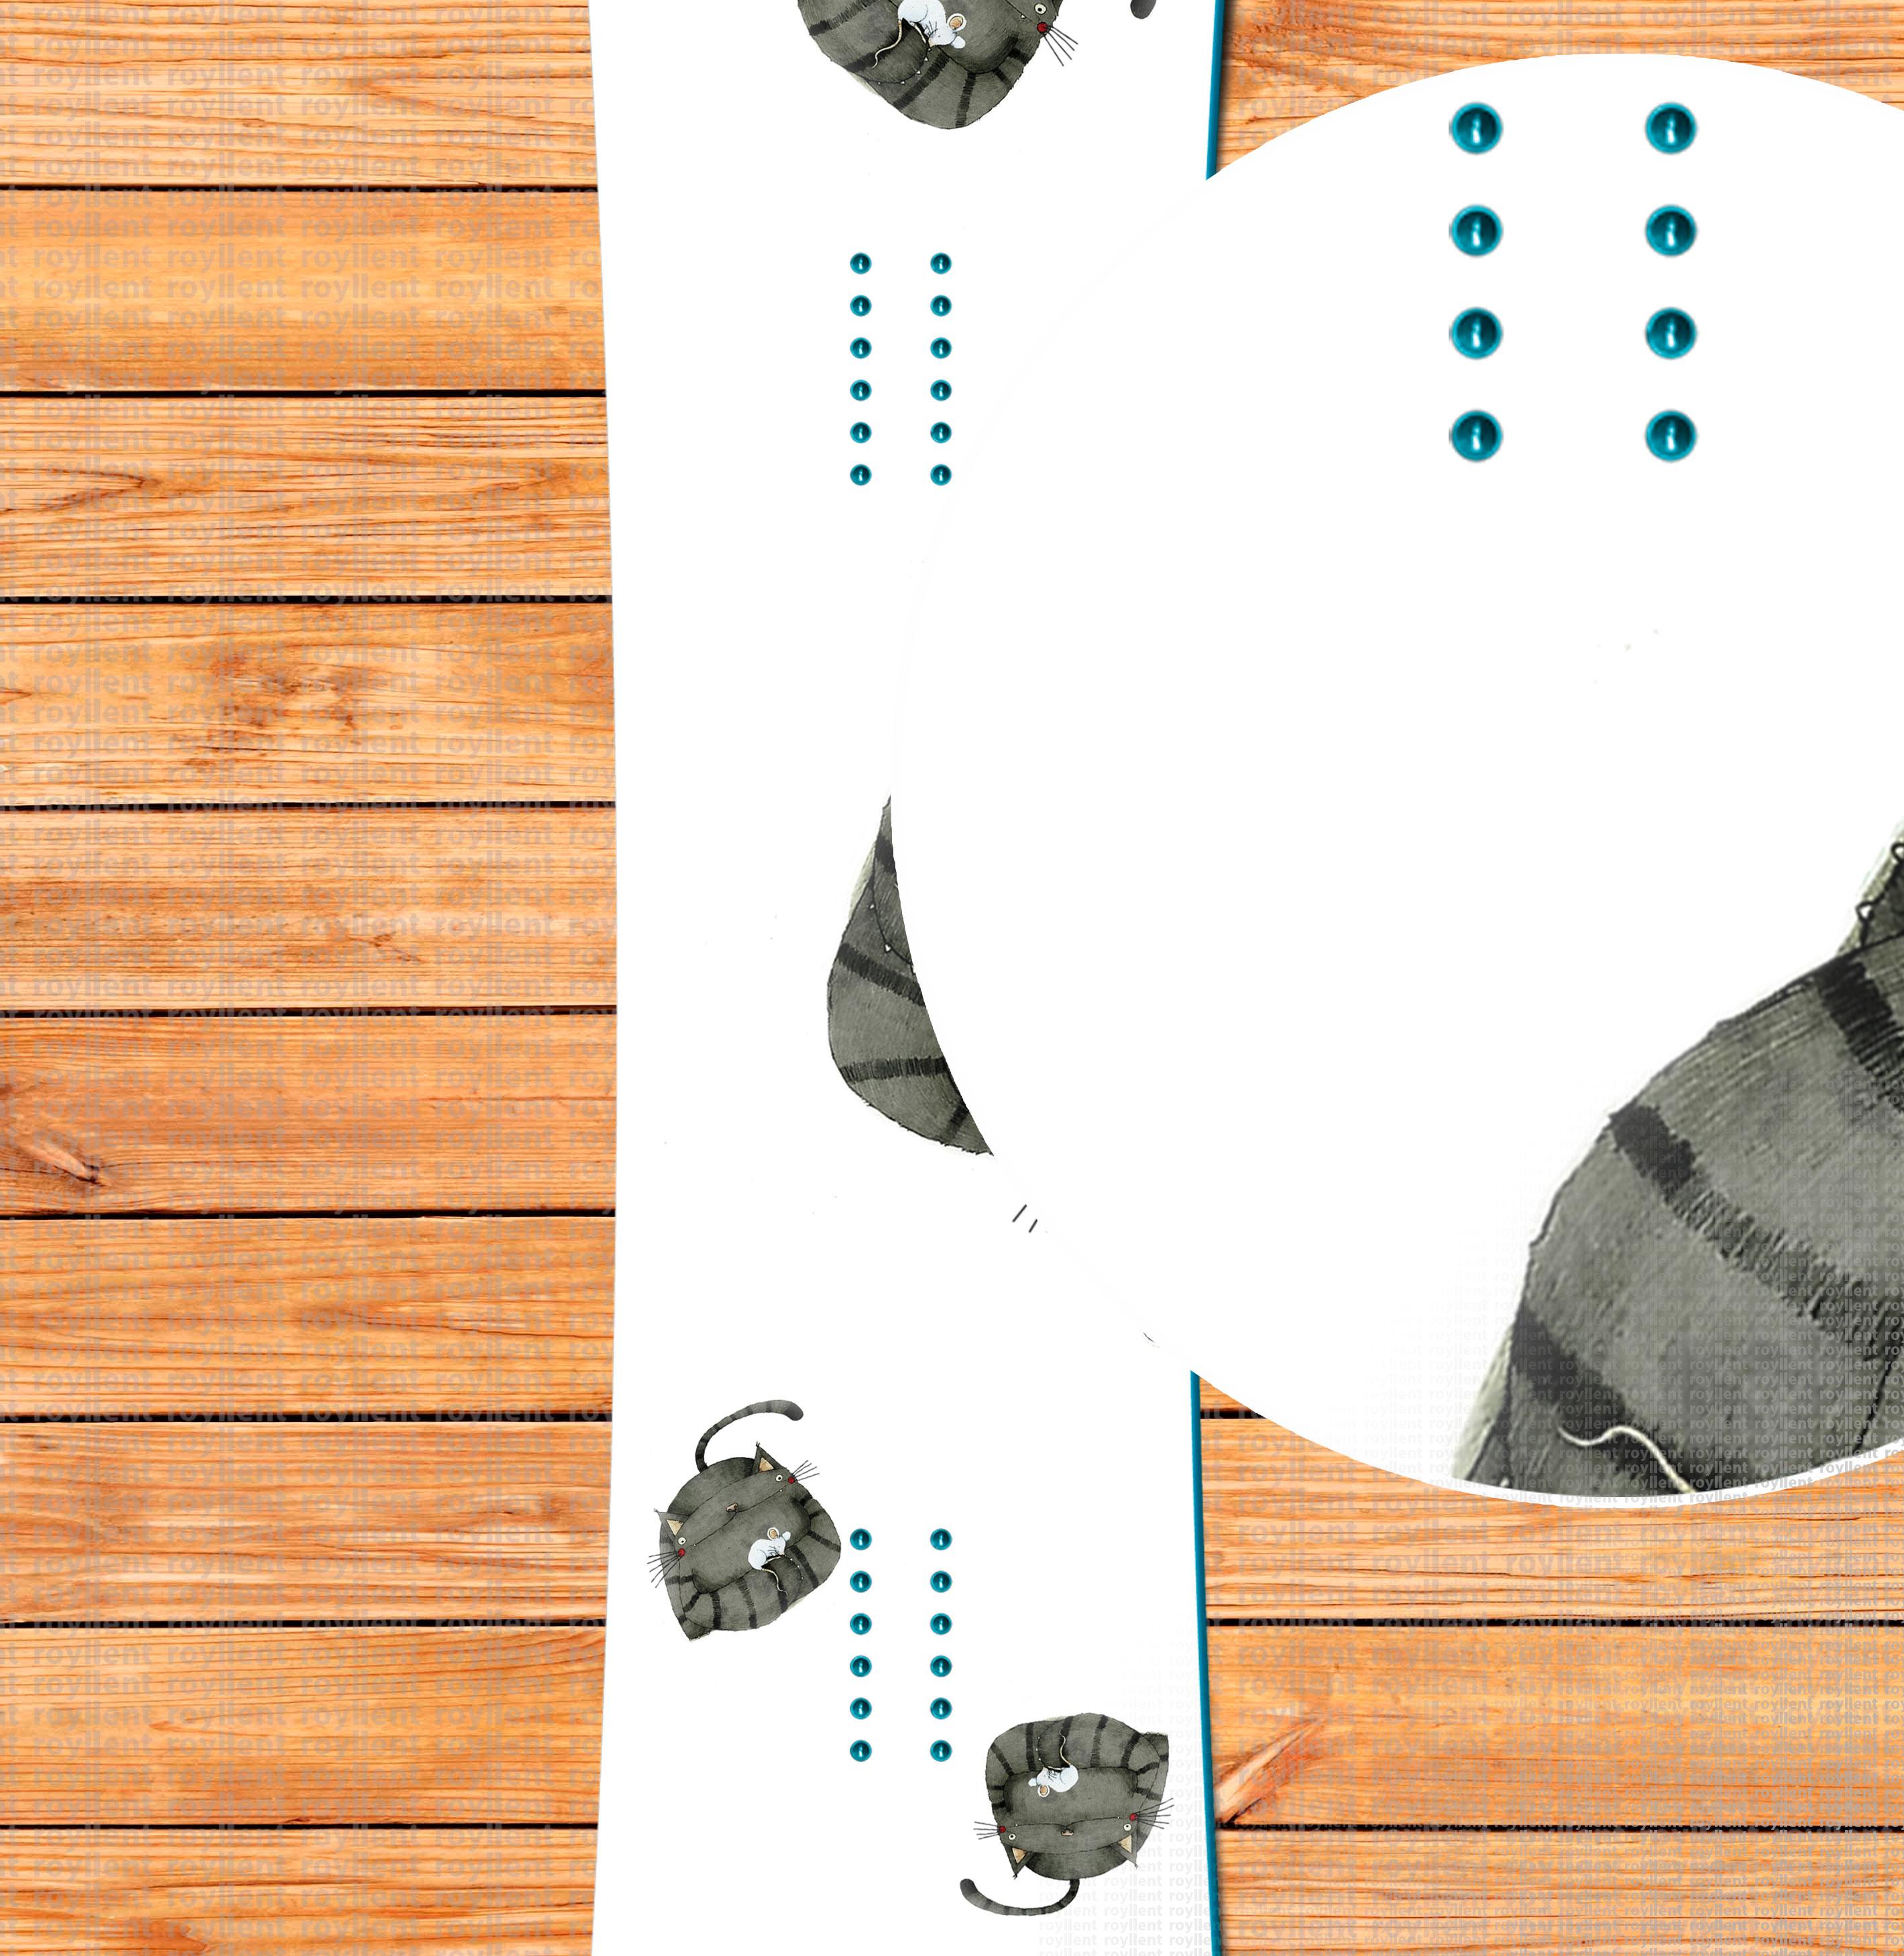 Сноуборд наклейка, Армхи, Ведучи, Лаго-Наки, Мамисон, Матлас, Цори, Эльбрус-Безенги, Урал и Поволжье, Башкортостан, Абзаково, Ак-Йорт, Арский Камень, Ассы-тау, Банное, Зирган-Тау, Кандры-Куль, Красный ключ, Куш-Тау, Шиханы, Мраткино, Белорецк, Олимпик Парк, Омшаник, Тазларово, Парк Победы, Уязы-Тау, Квань, Долина Кувандык, Ташла, Ашатли, Губаха, Жебреи, Иван-Гора